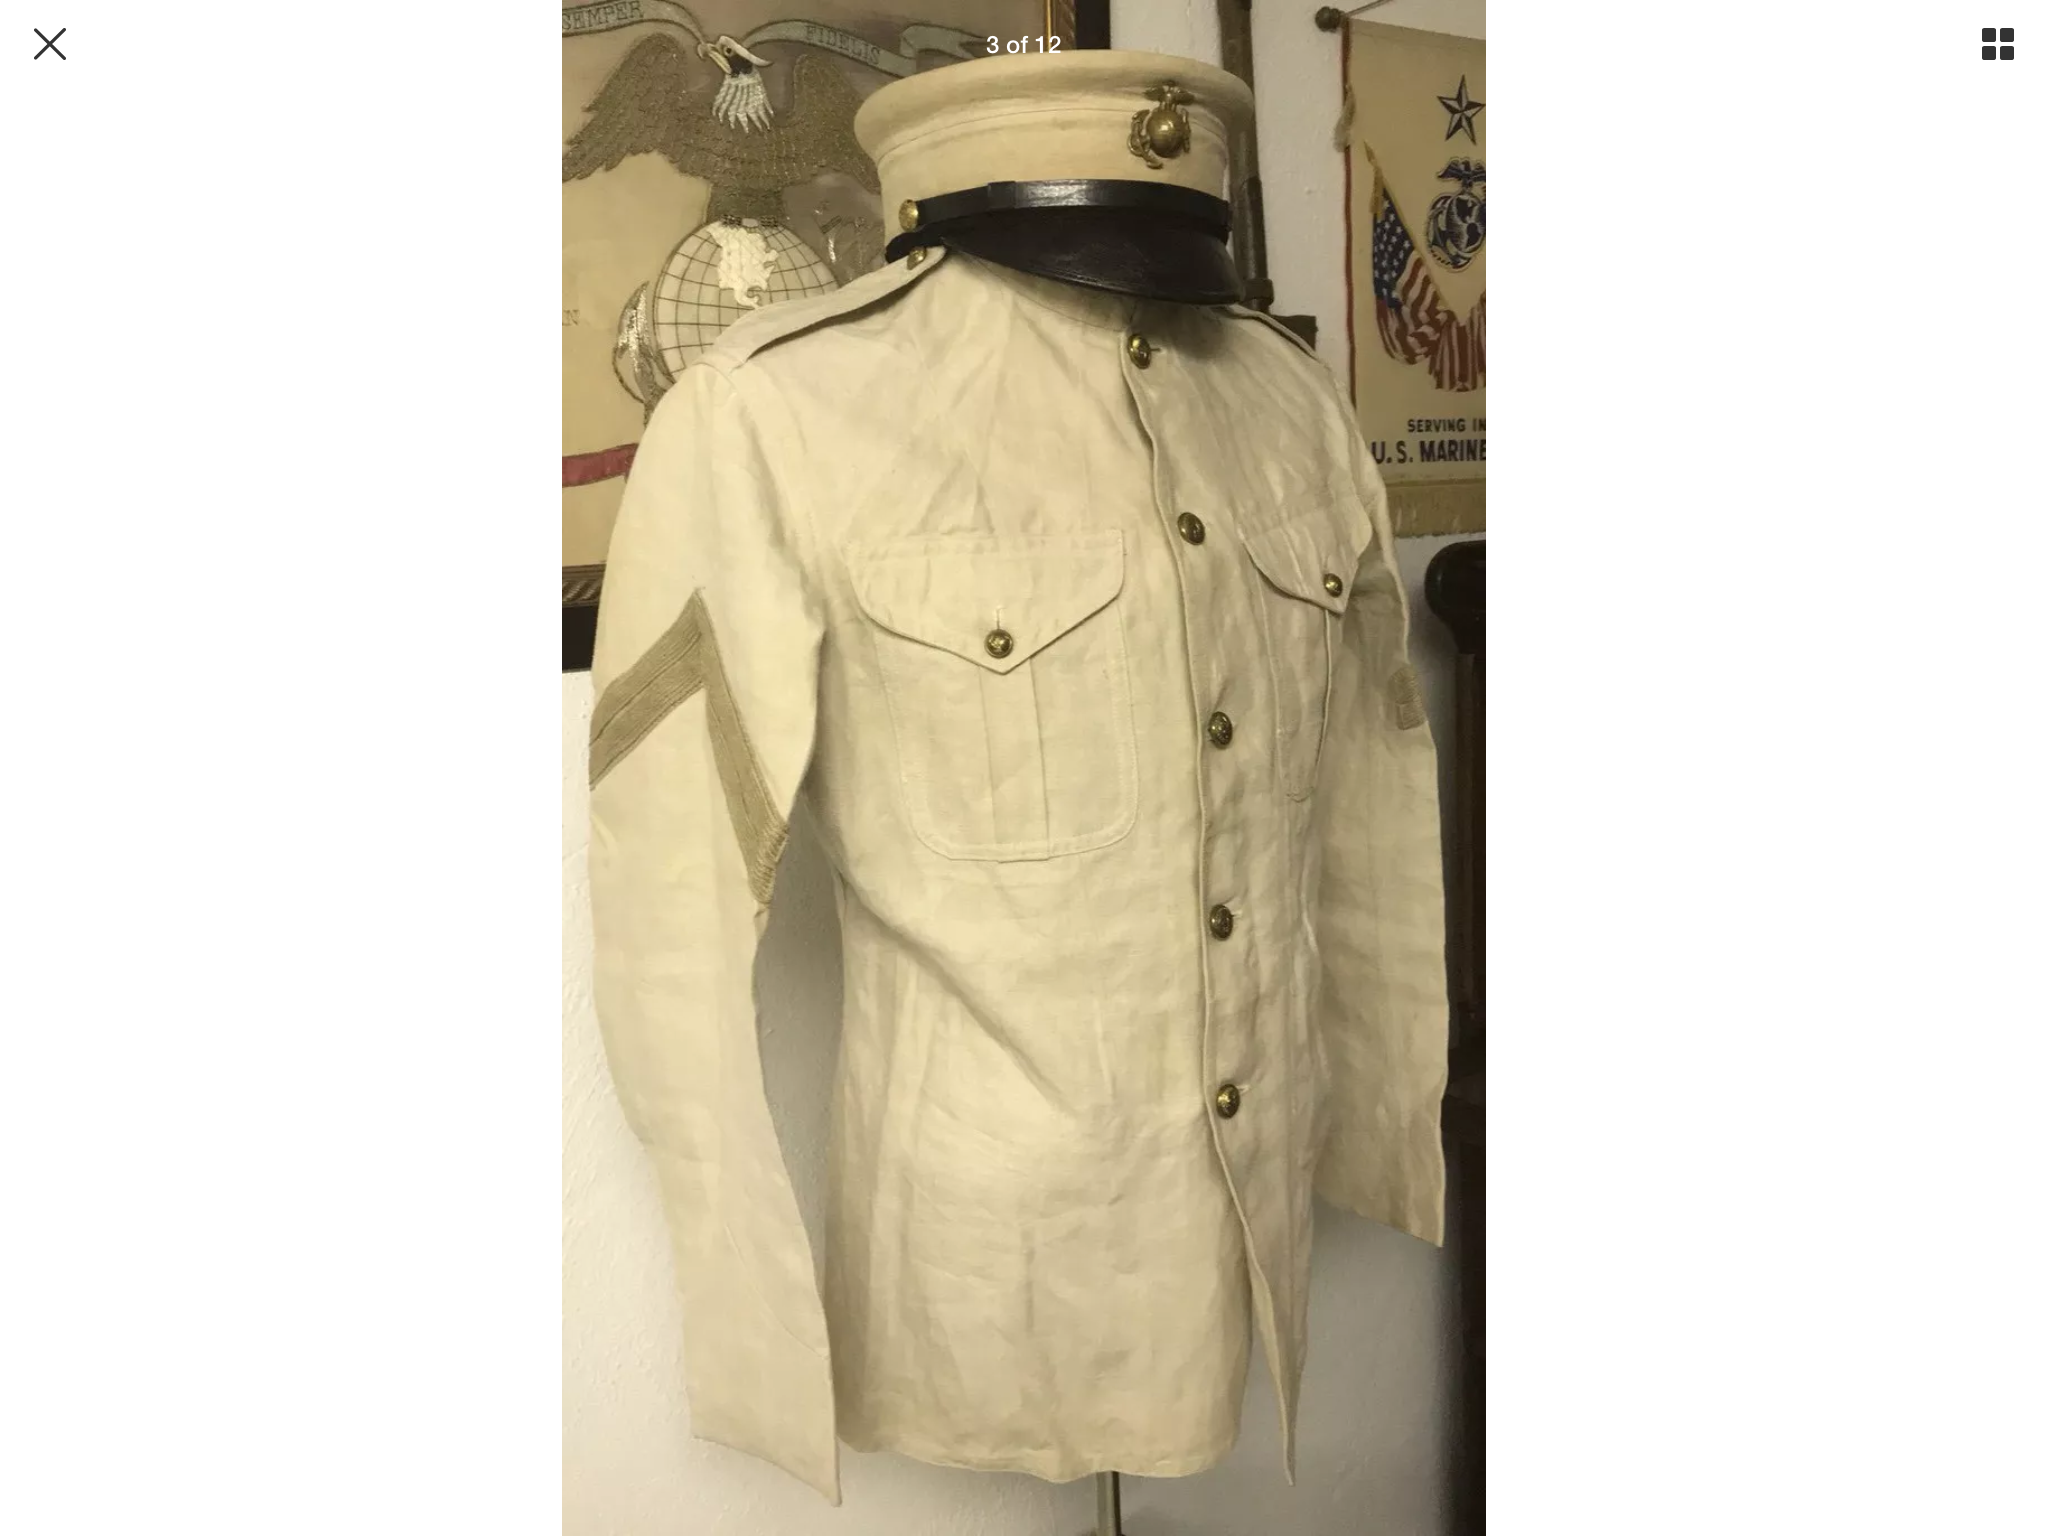 USMC Pre 1912 Corporal 's Summer Service Uniform | Marine